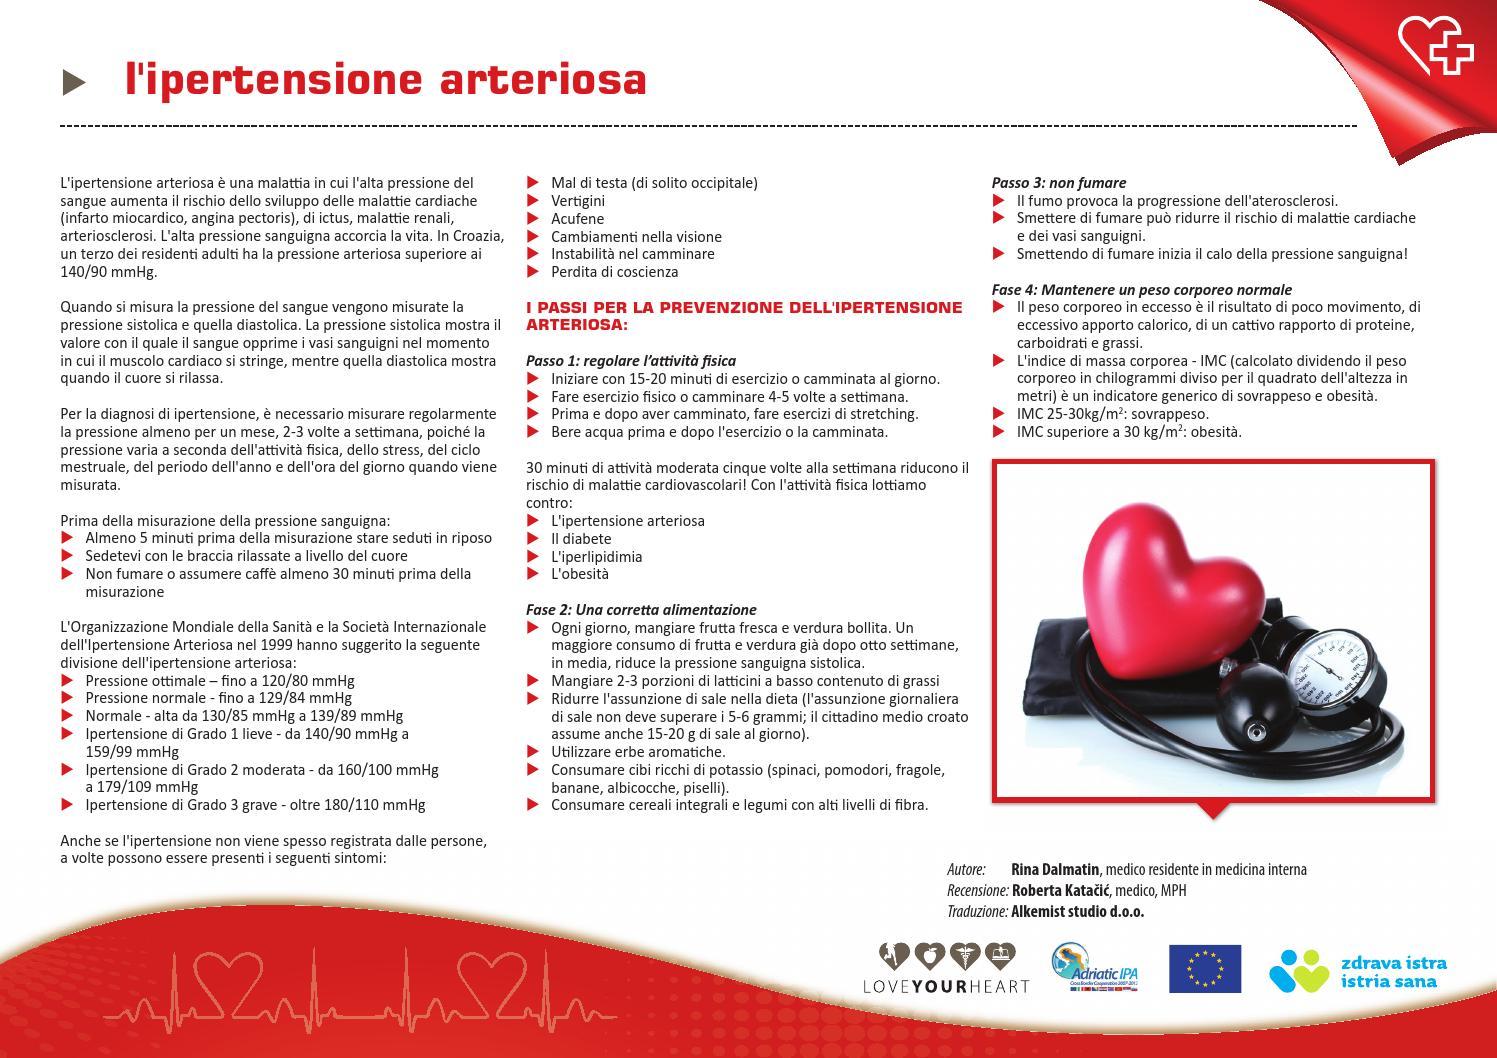 Симптоматические гипертензии это - La pressione arteriosa desiderata nellipertensione